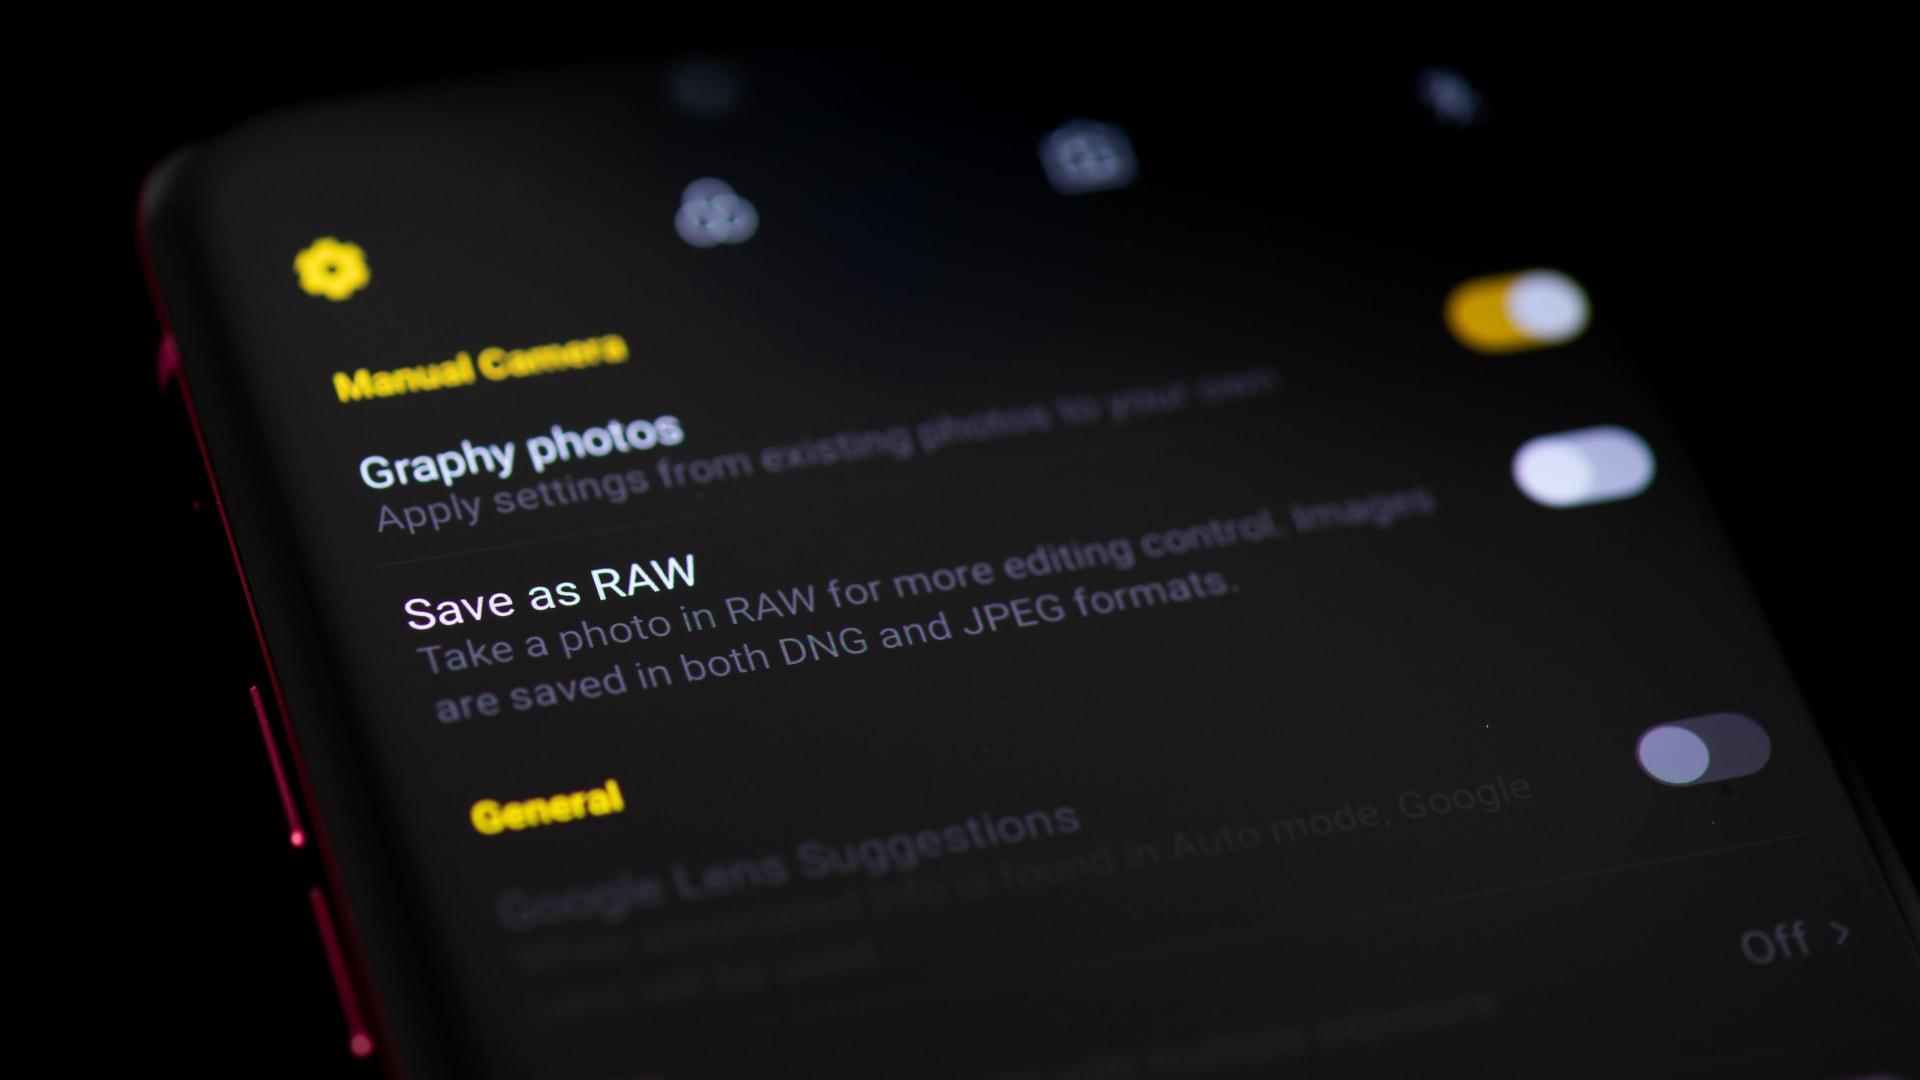 A screen shot of a smart phone